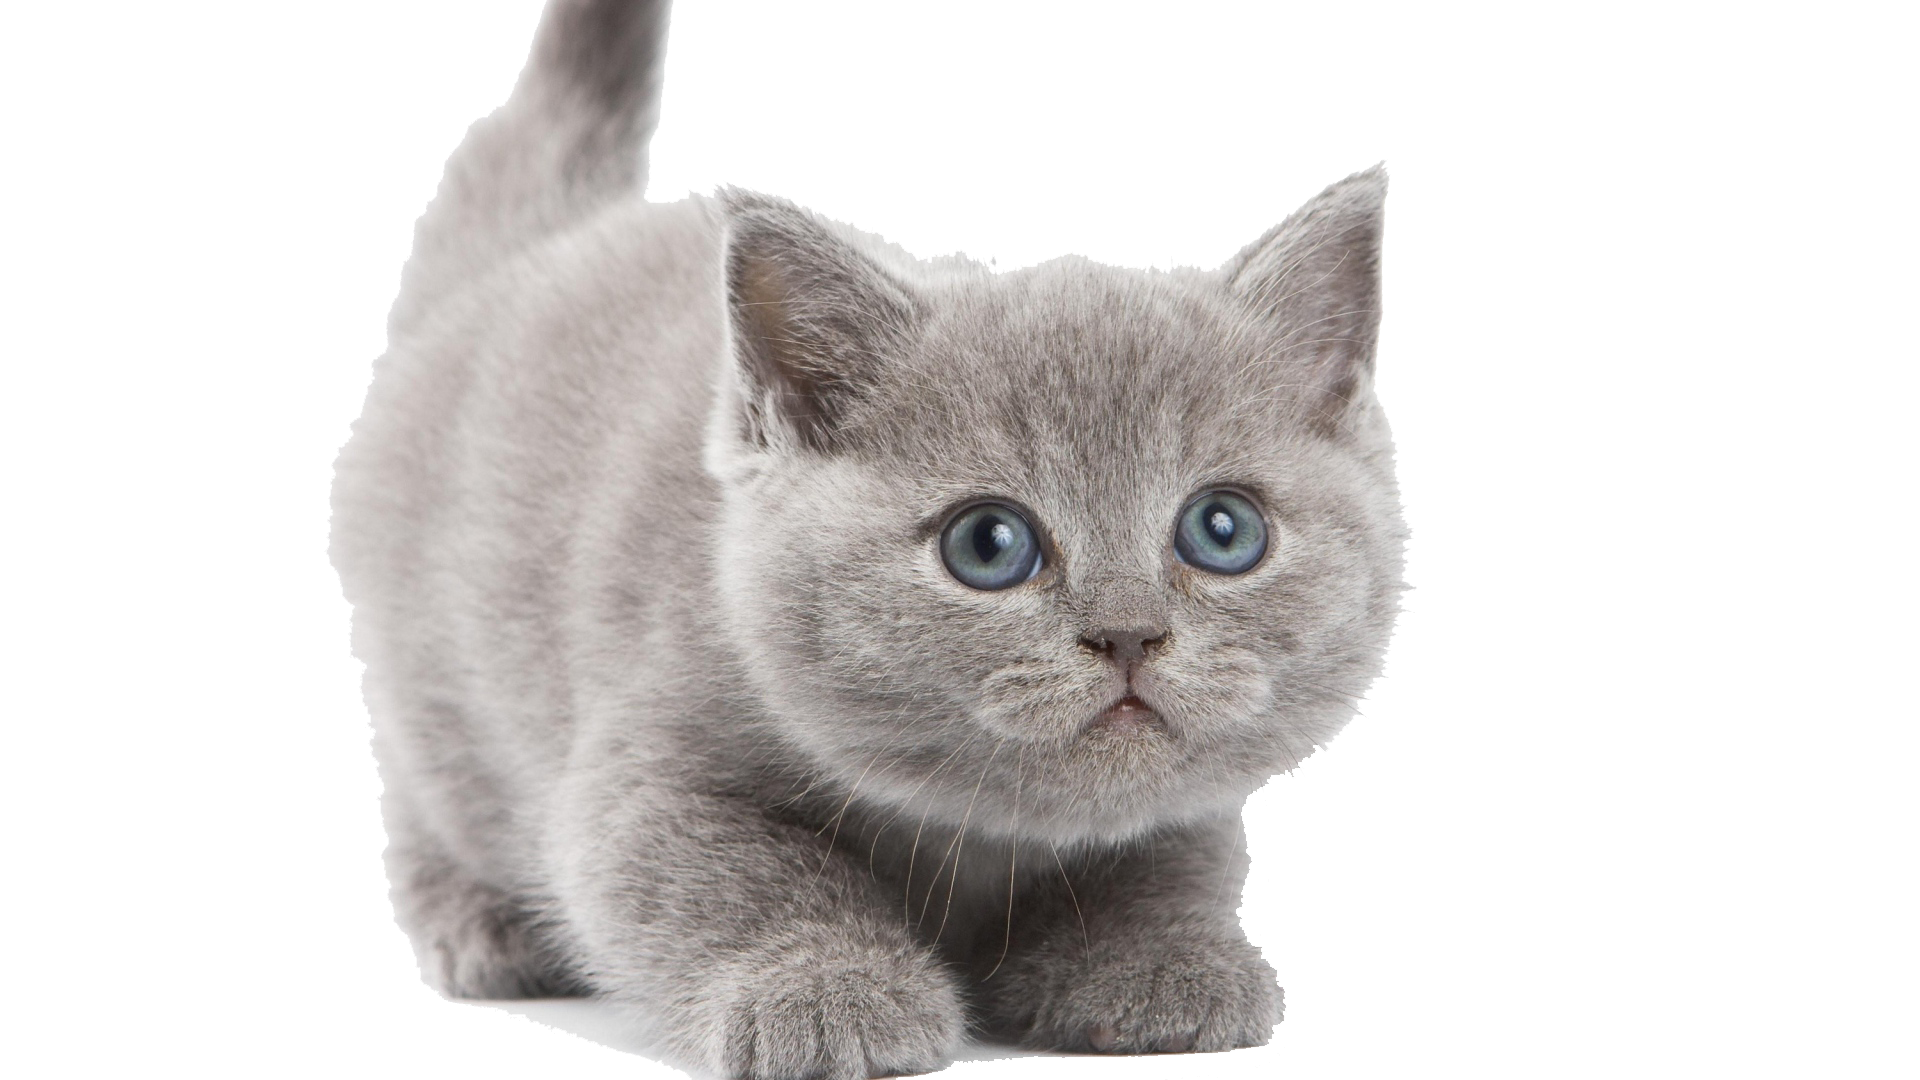 briar-core/src/main/resources/kitten6.png